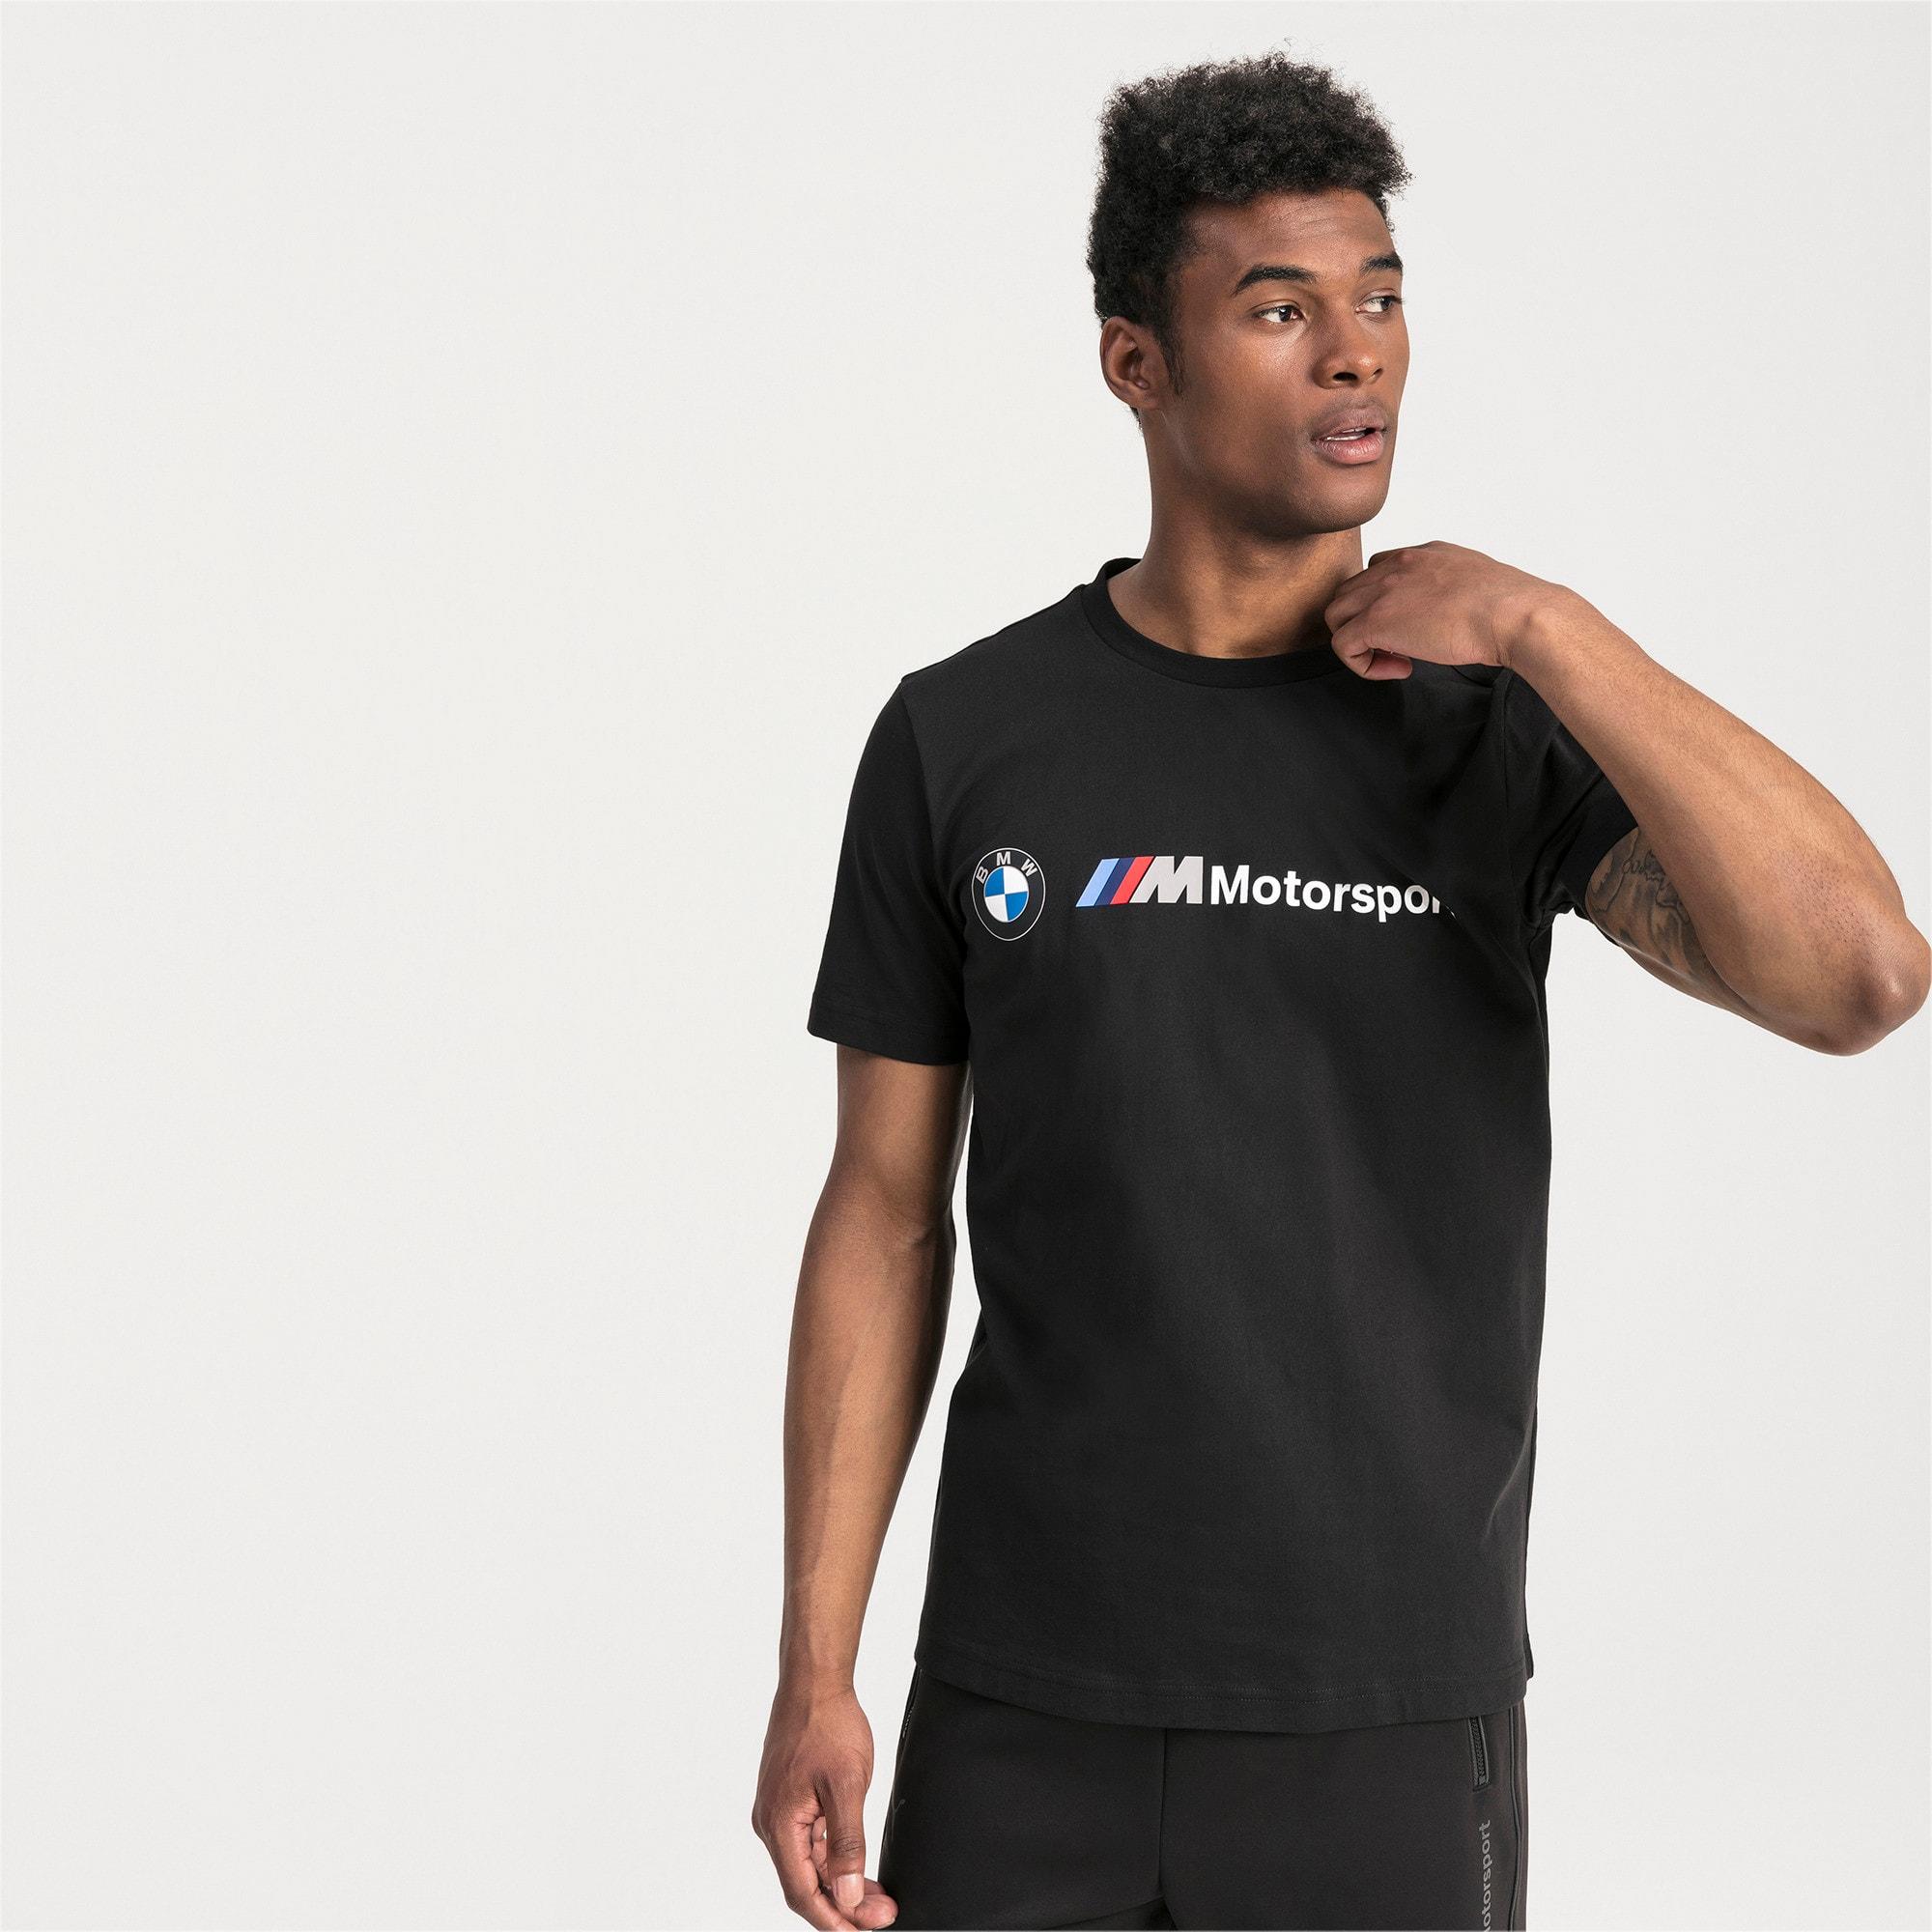 Thumbnail 1 of T-shirt con logo BMW M Motorsport uomo, Puma Black, medium